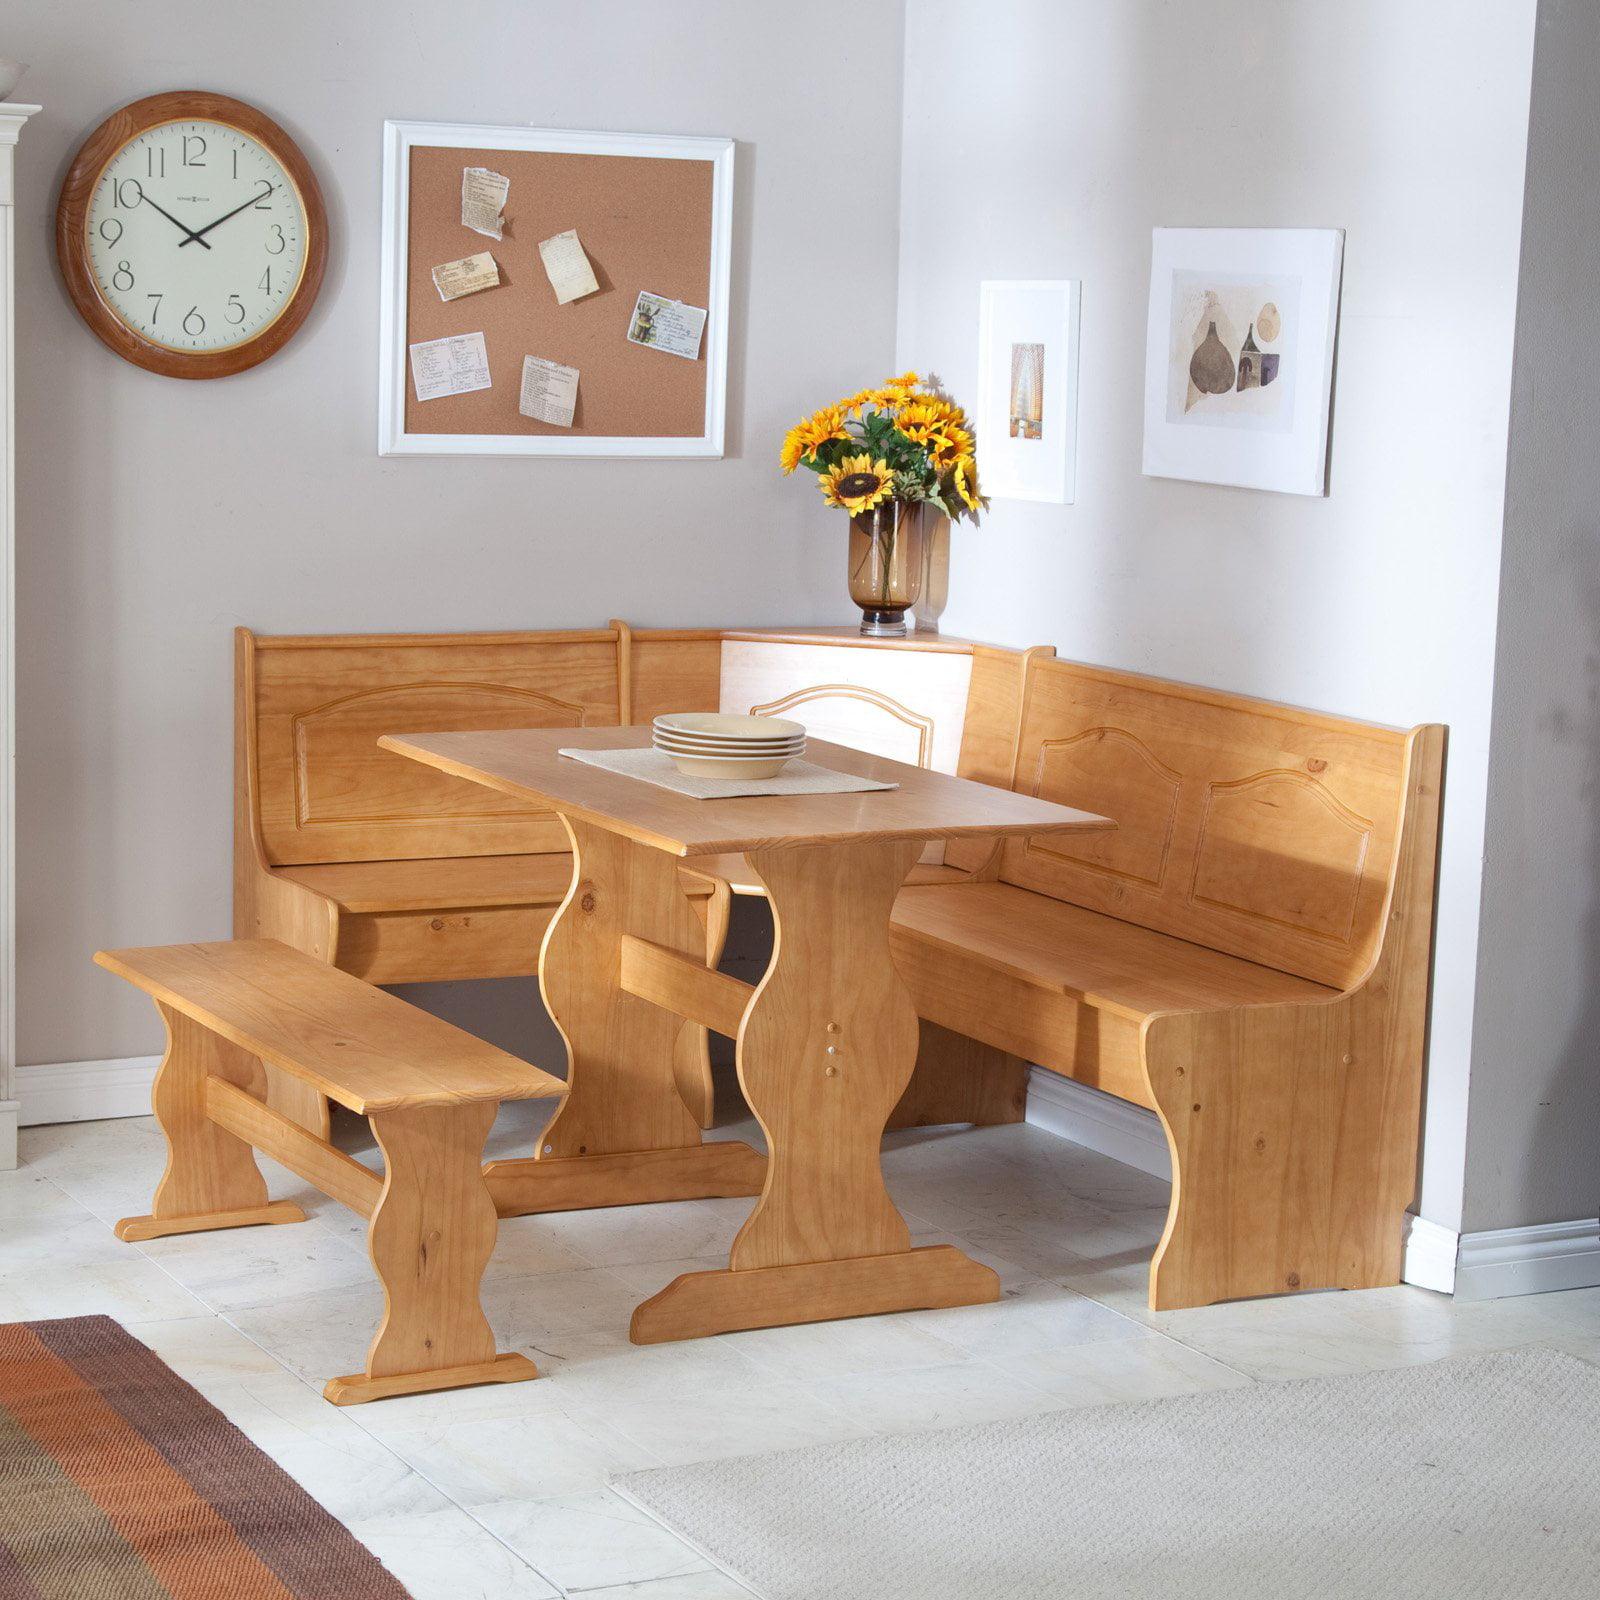 Corner Tables Furniture. Corner Tables Furniture F